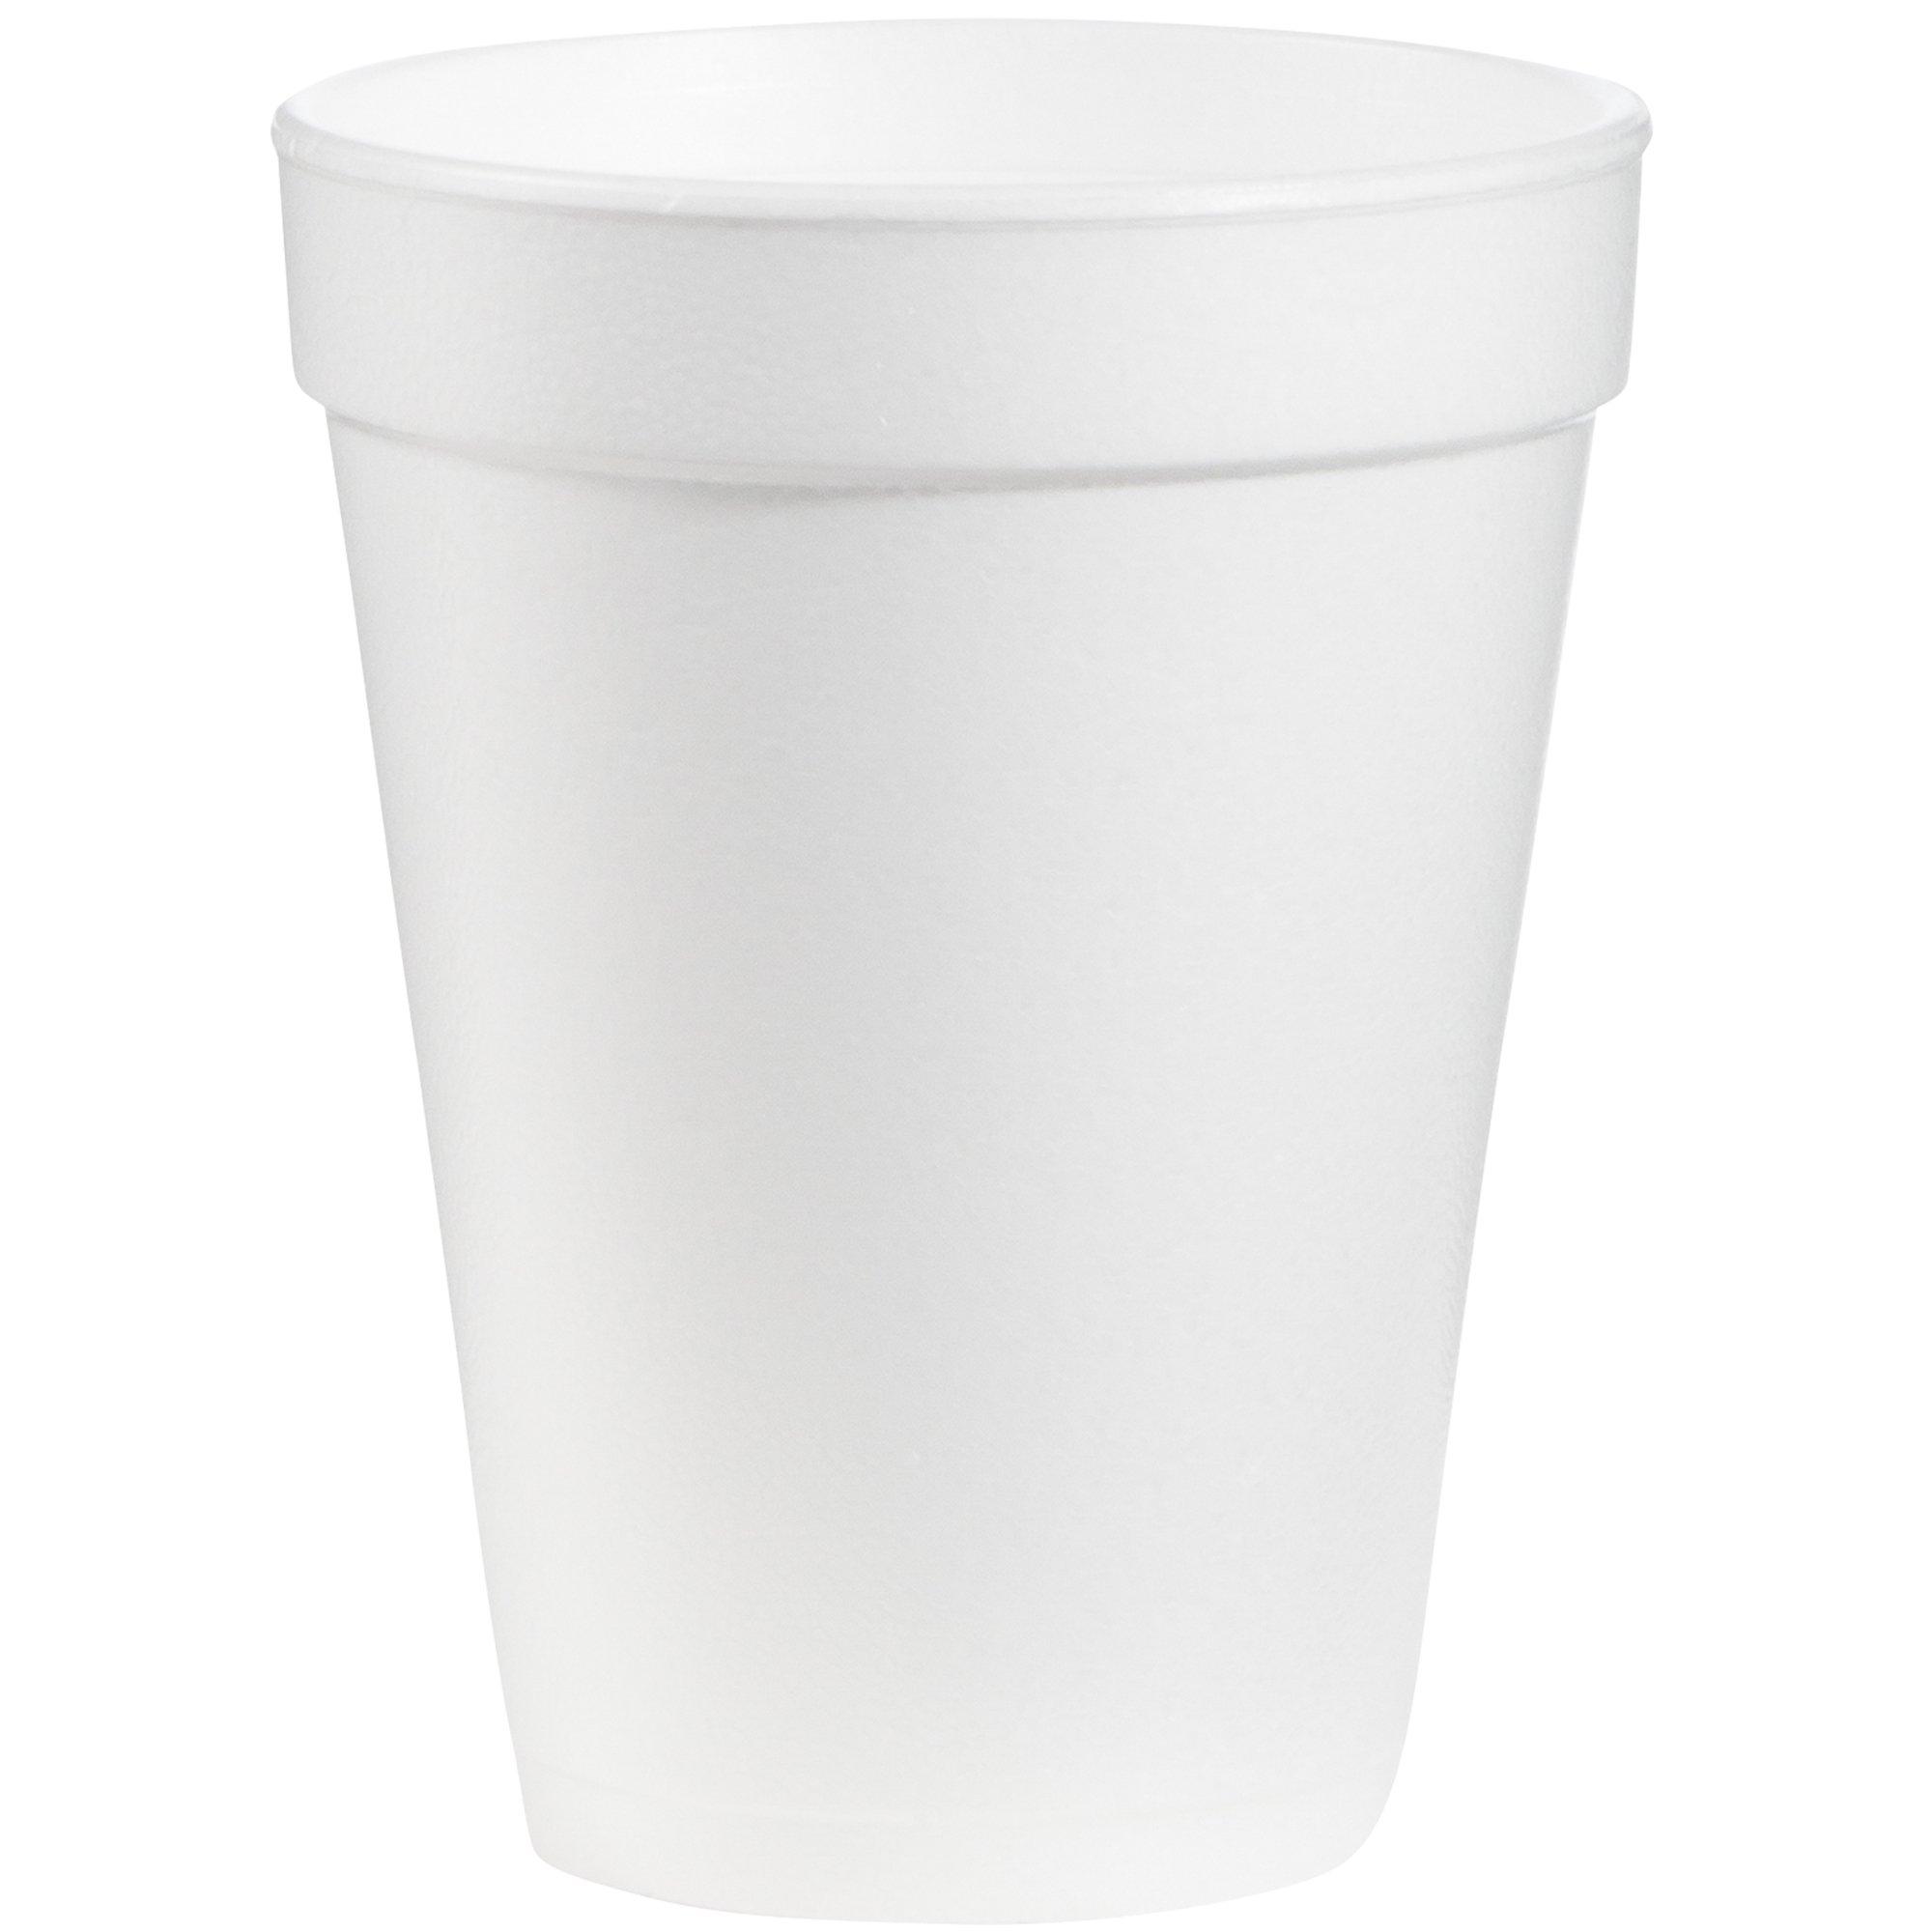 Dart DRC14J16 Styrofoam Insulated Foam Cups, 14 oz (Pack of 25)